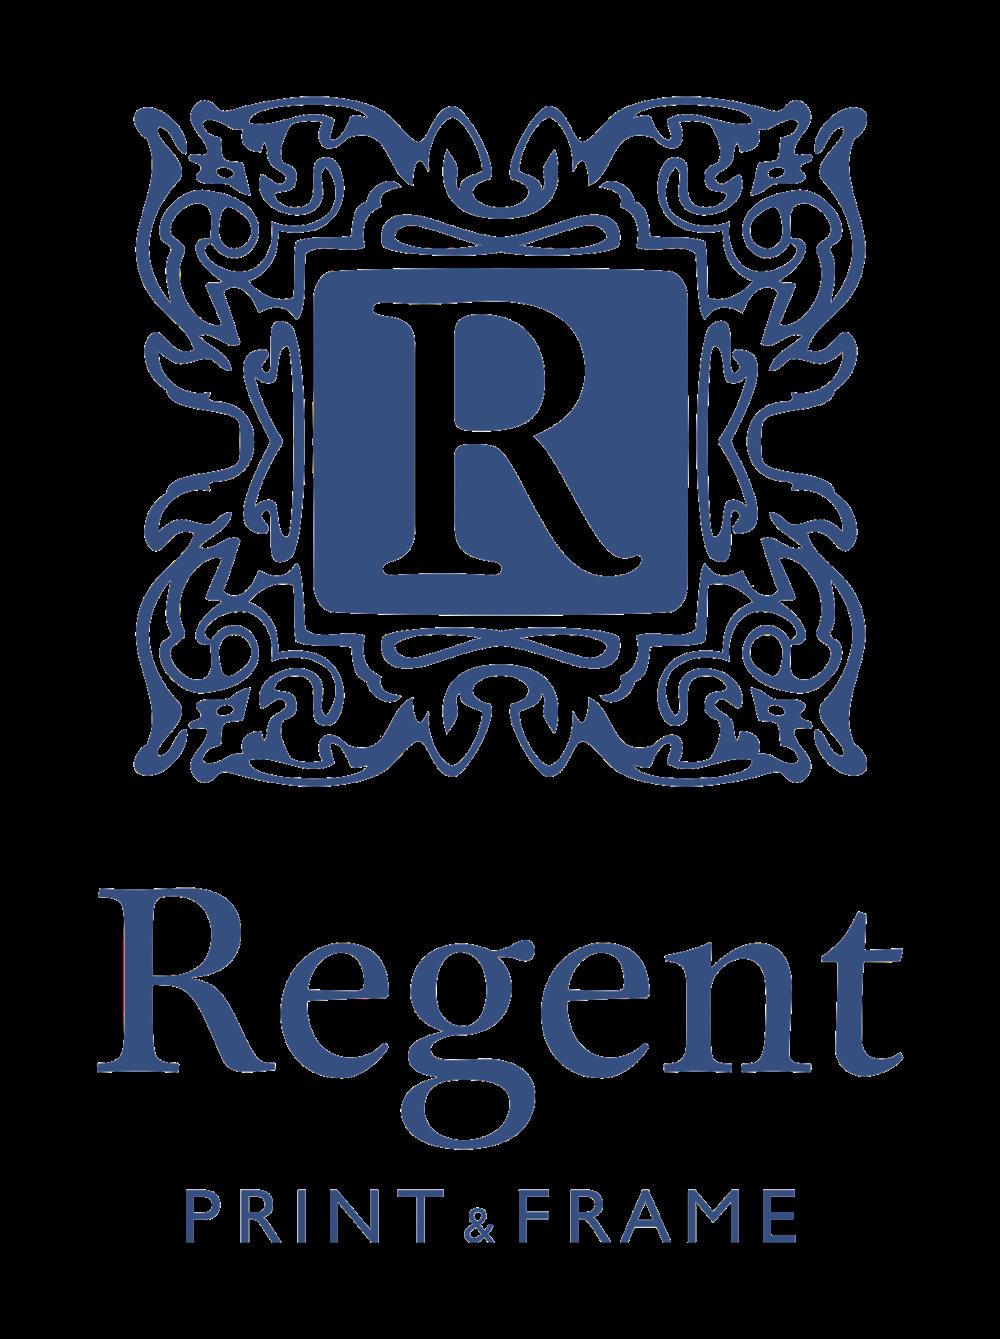 Regent Print & Frame, Leamington Spa, logo